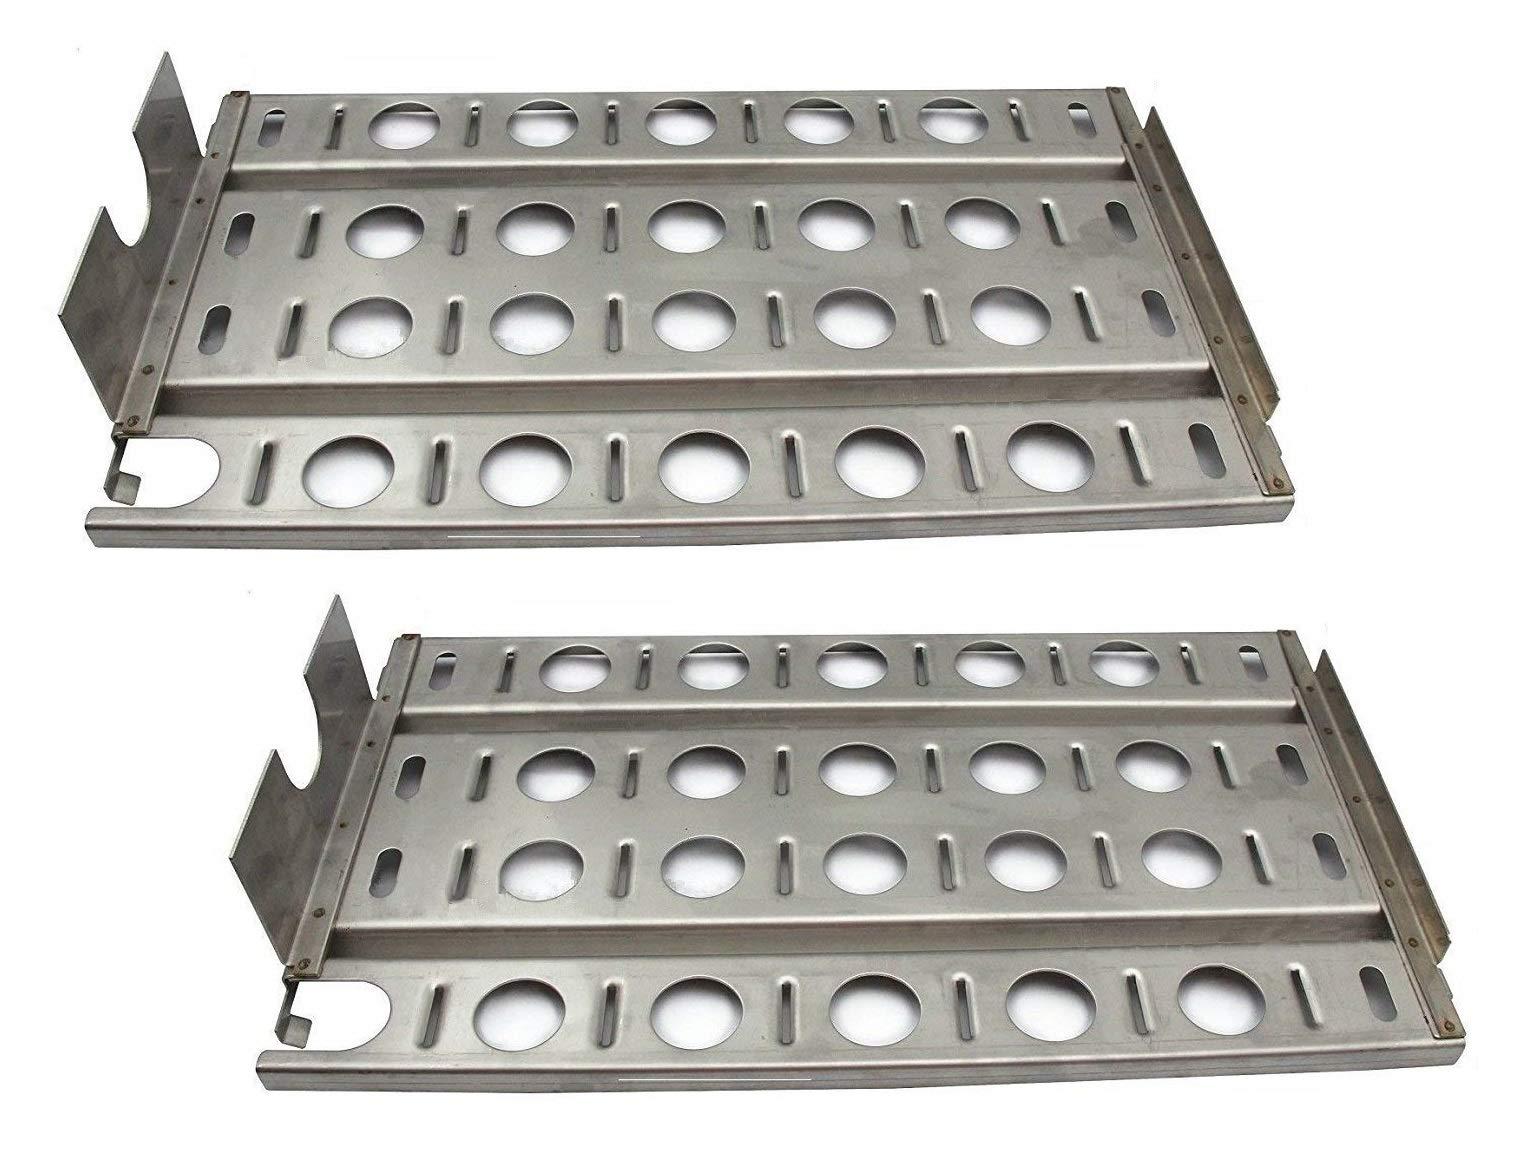 Hongso SPB571-2 Stainless Steel BBQ Gas Grill Heat Plate, Heat Shield for Lynx L27 Models (16 7/8'' x 9 1/2'') by Hongso